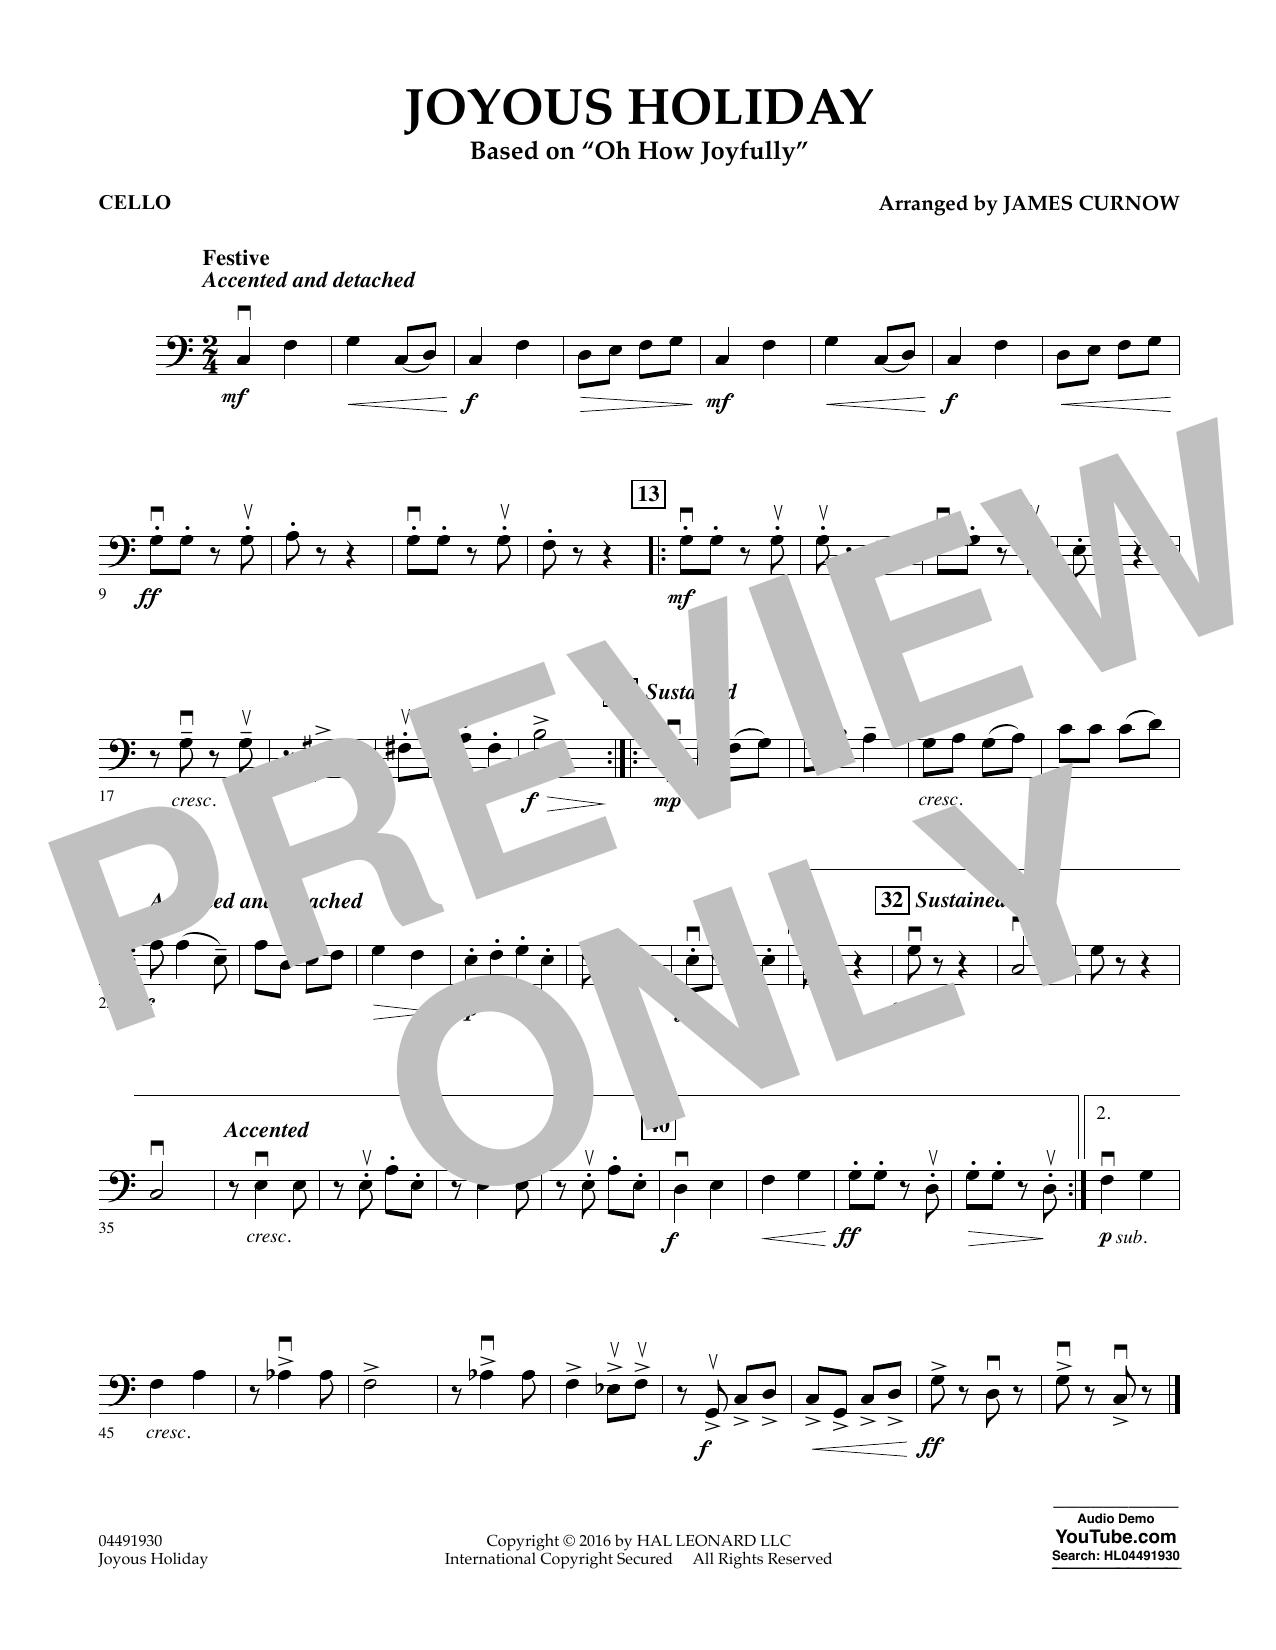 Joyous Holiday (based on Oh How Joyfully) - Cello